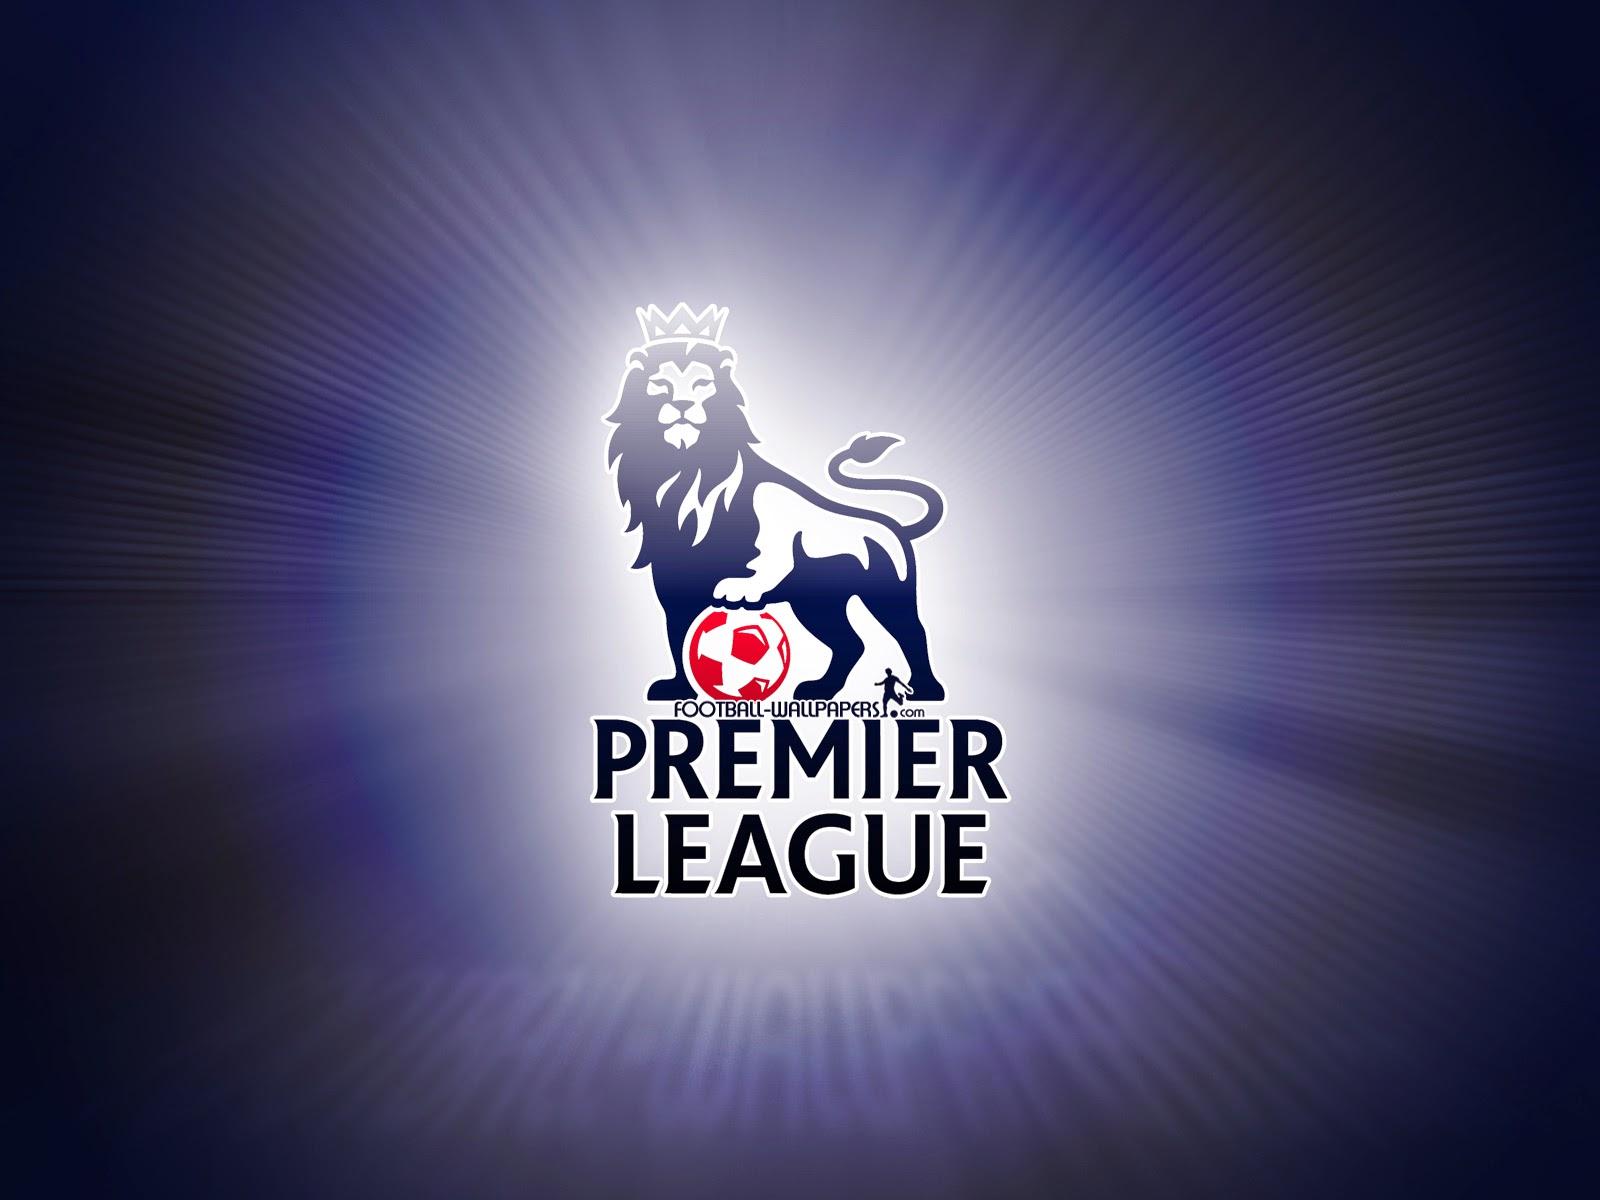 Prediksi Bola Newcastle United vs Liverpool 1 November 2014